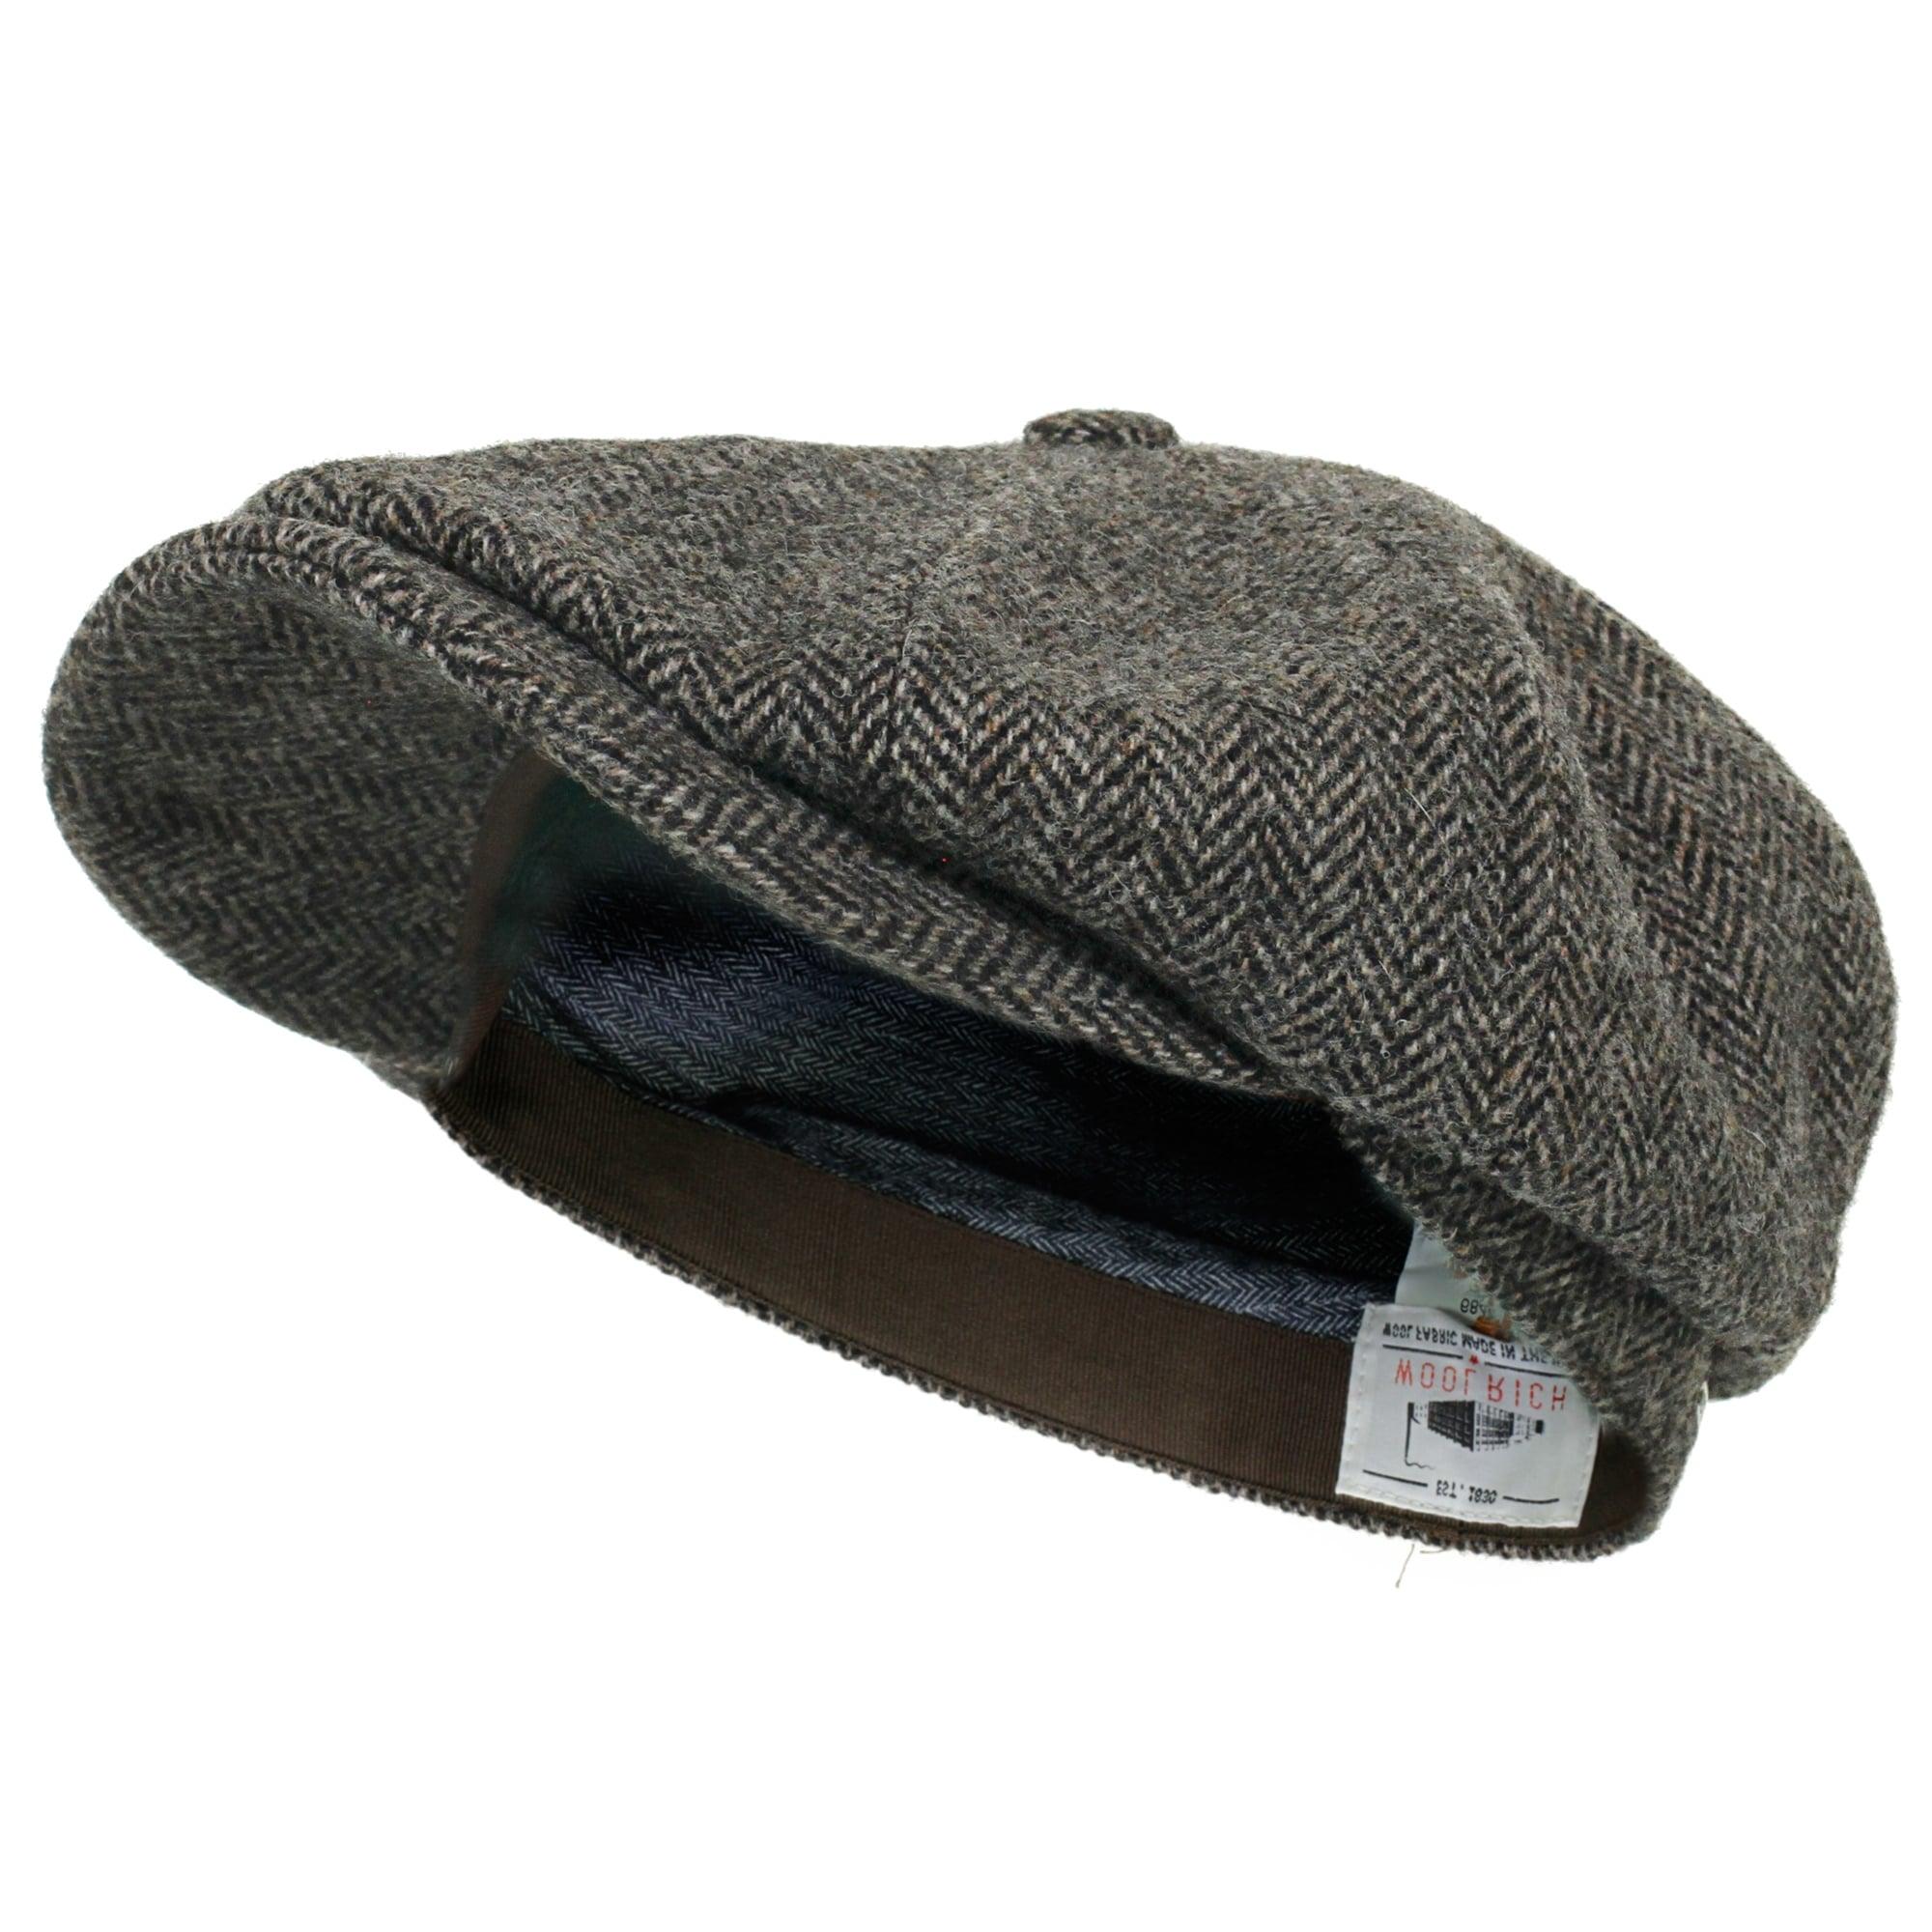 Stetson Hatteras Woolrich Herringbone Grey Newsboy Hat 6840514 333 a3ce26cbcc5